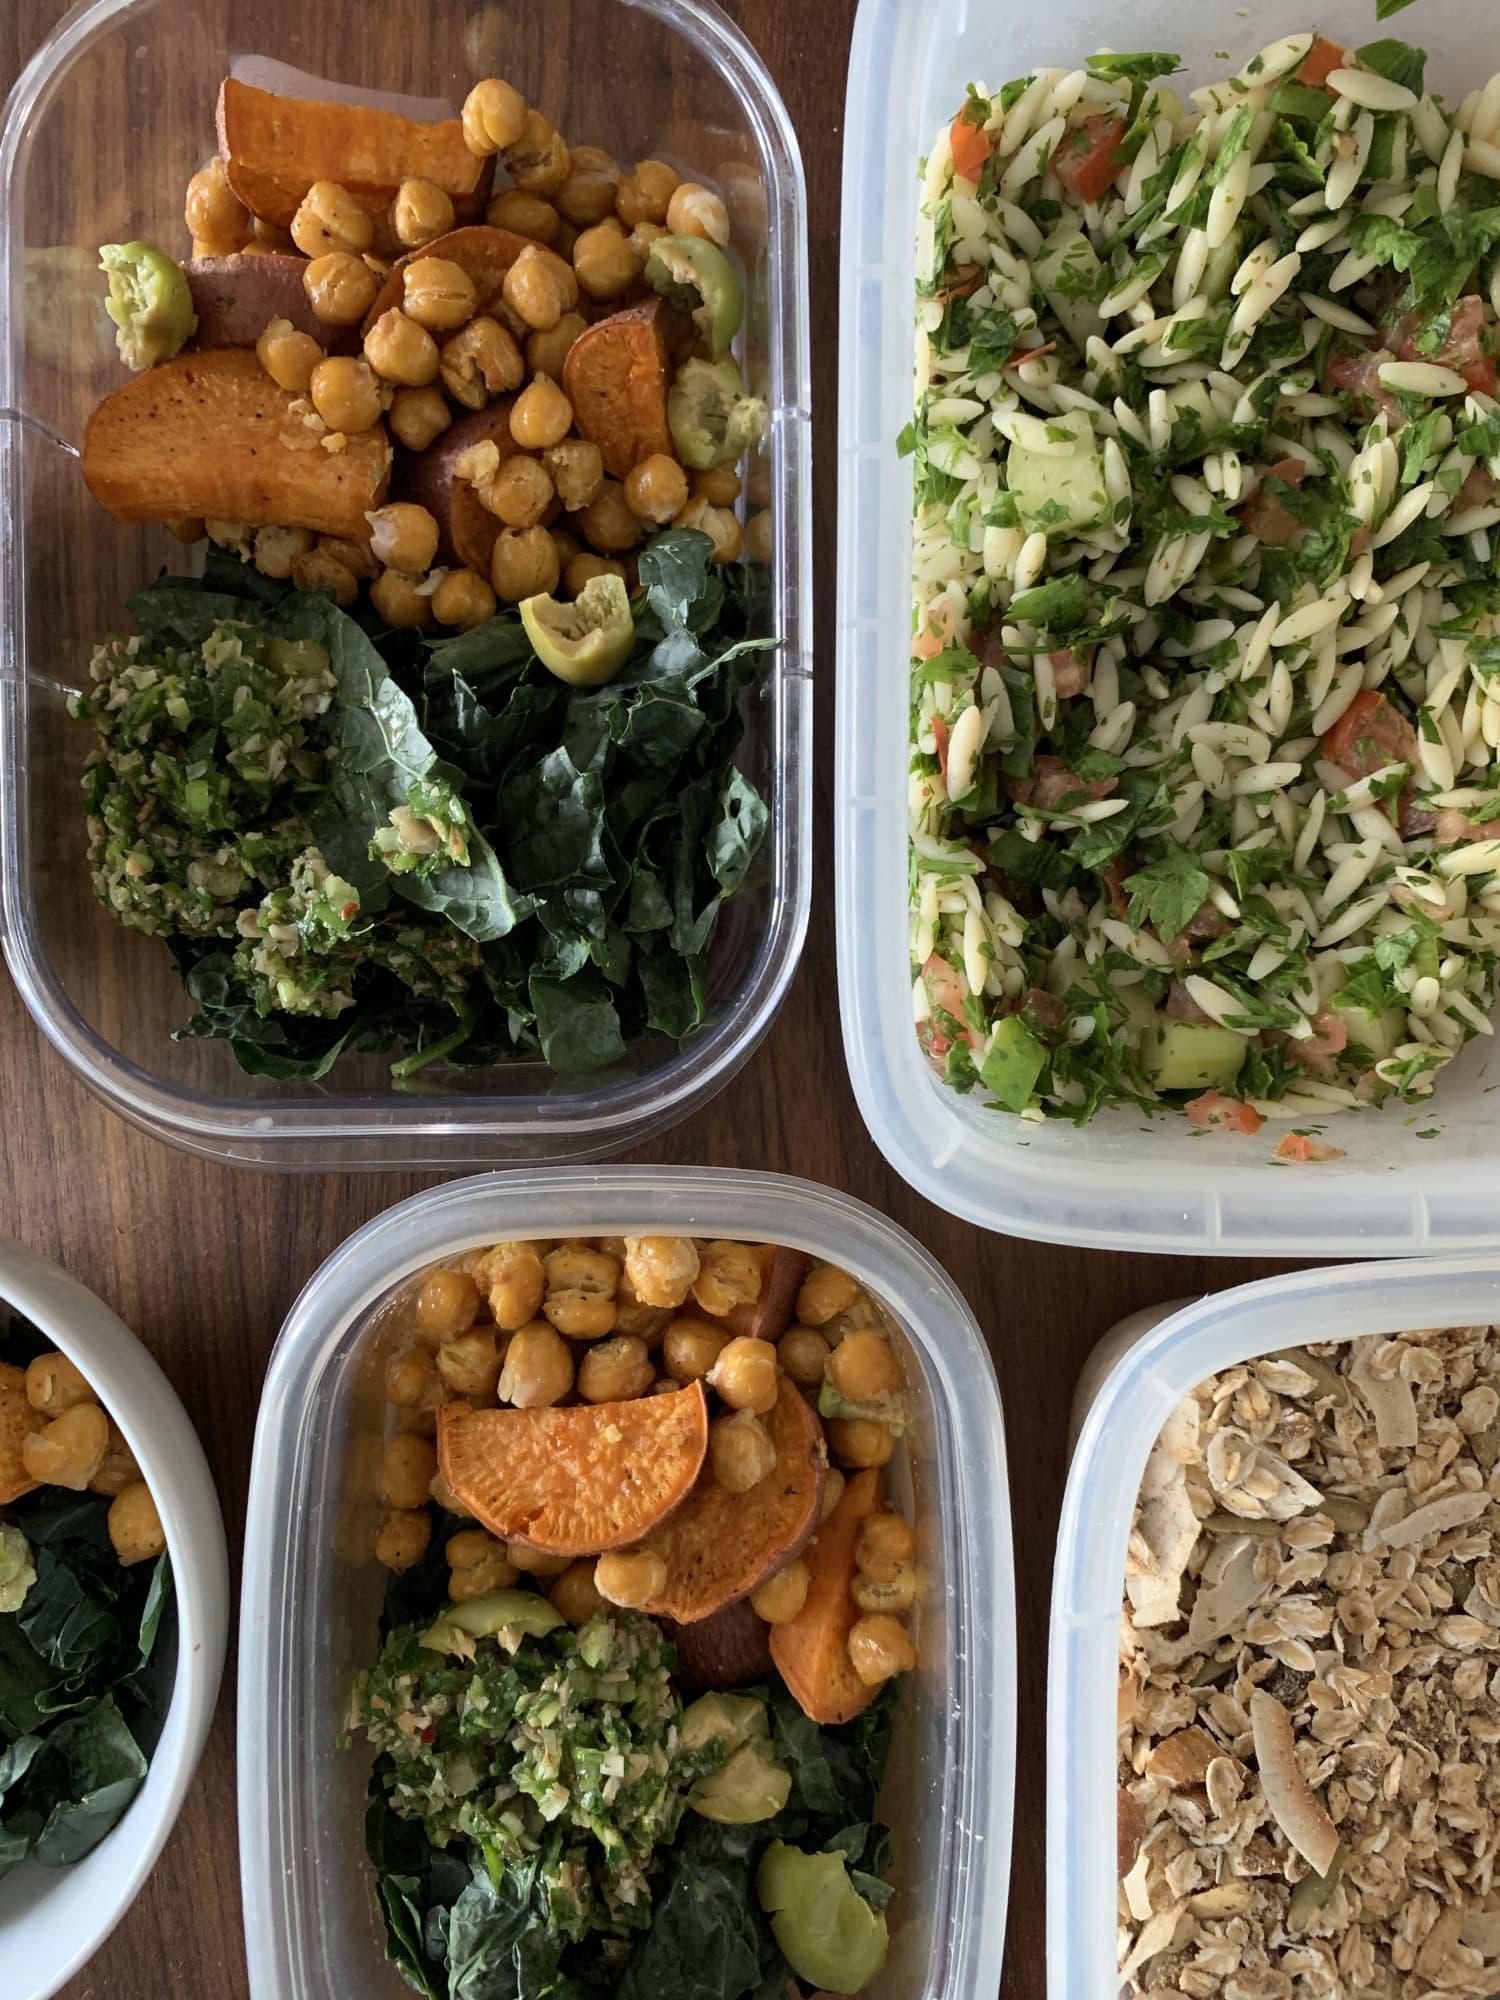 Meal Prep Plan: How I Prep a Week of Meatless Meals in Under 2 Hours